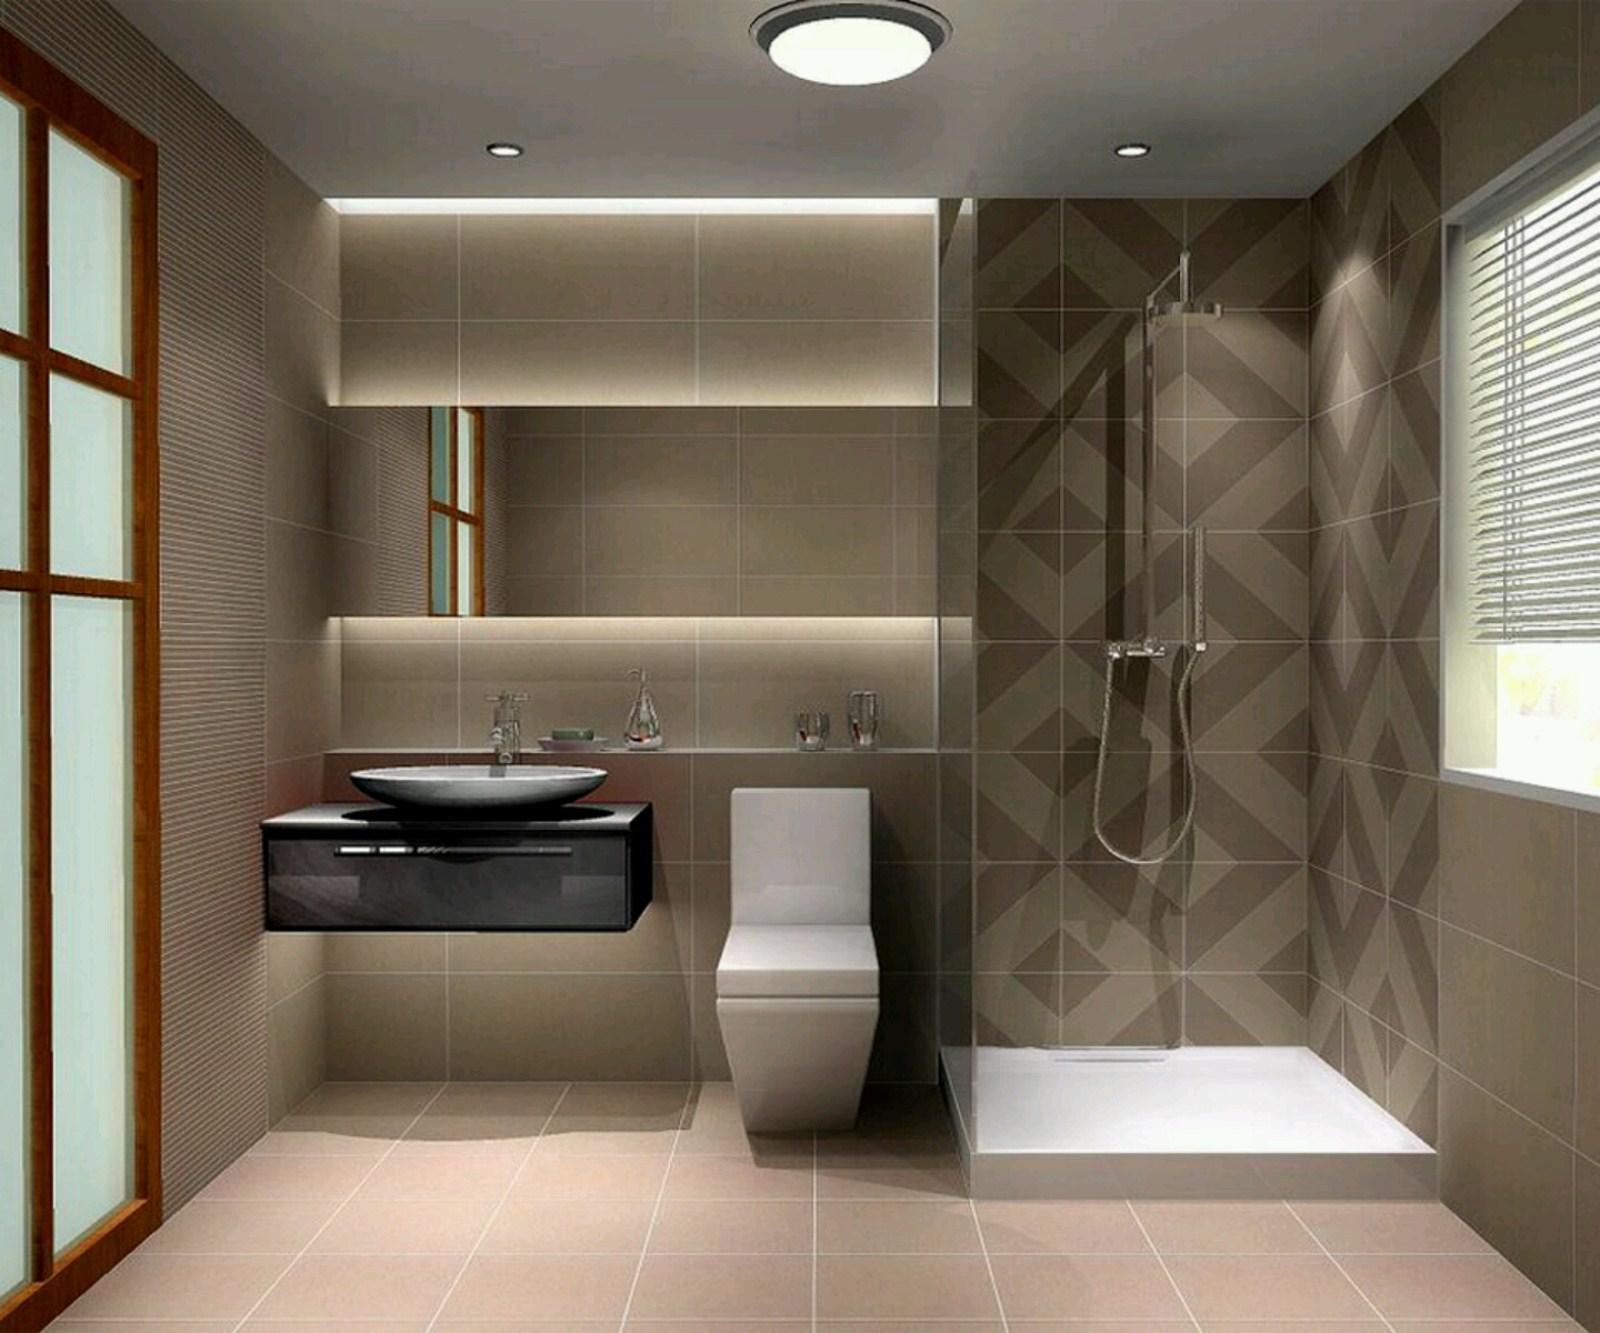 صور حمامات سيراميك .